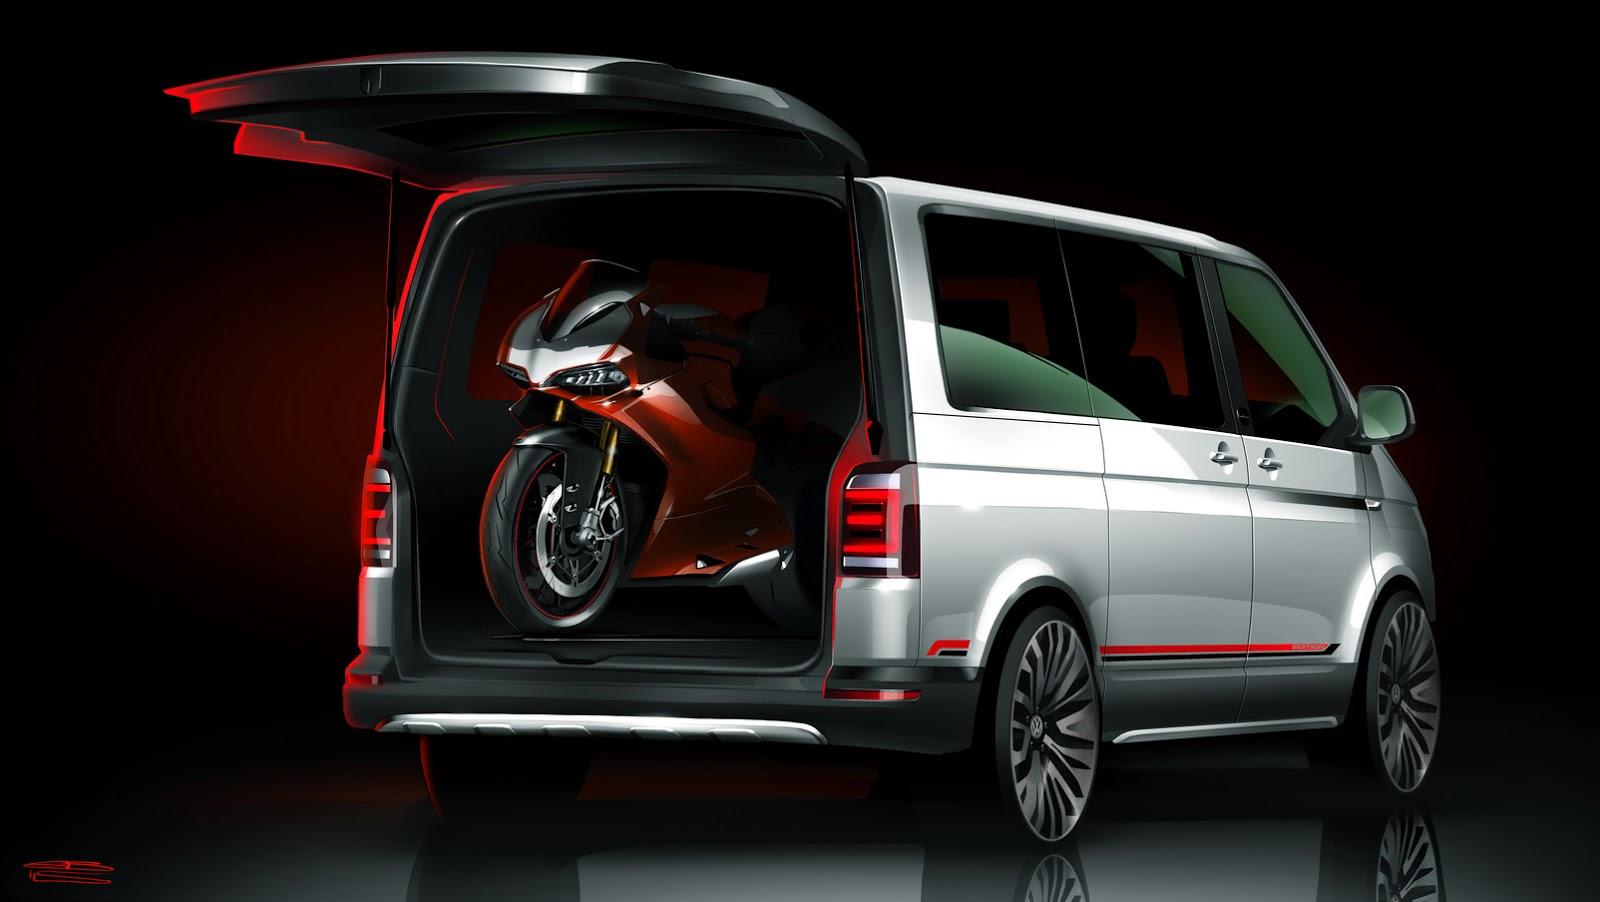 VW Multivan PanAmericana Concept For Easy Riders